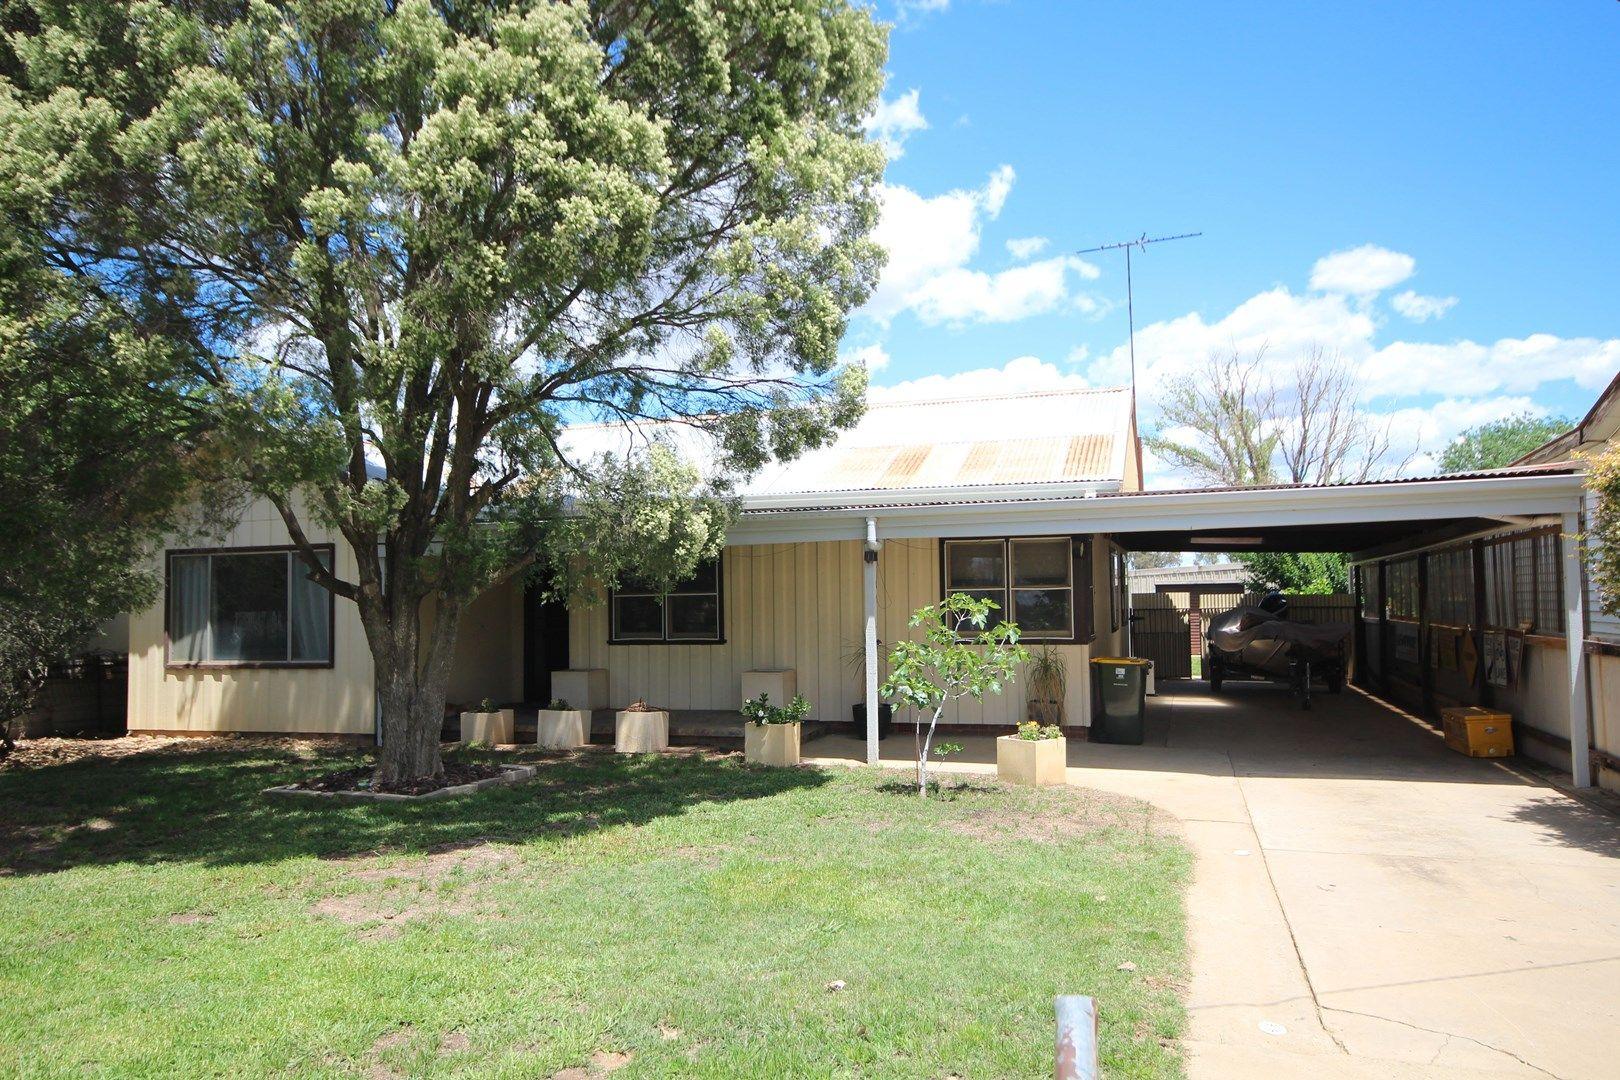 3913 Sturt Highway, Gumly Gumly NSW 2652, Image 0